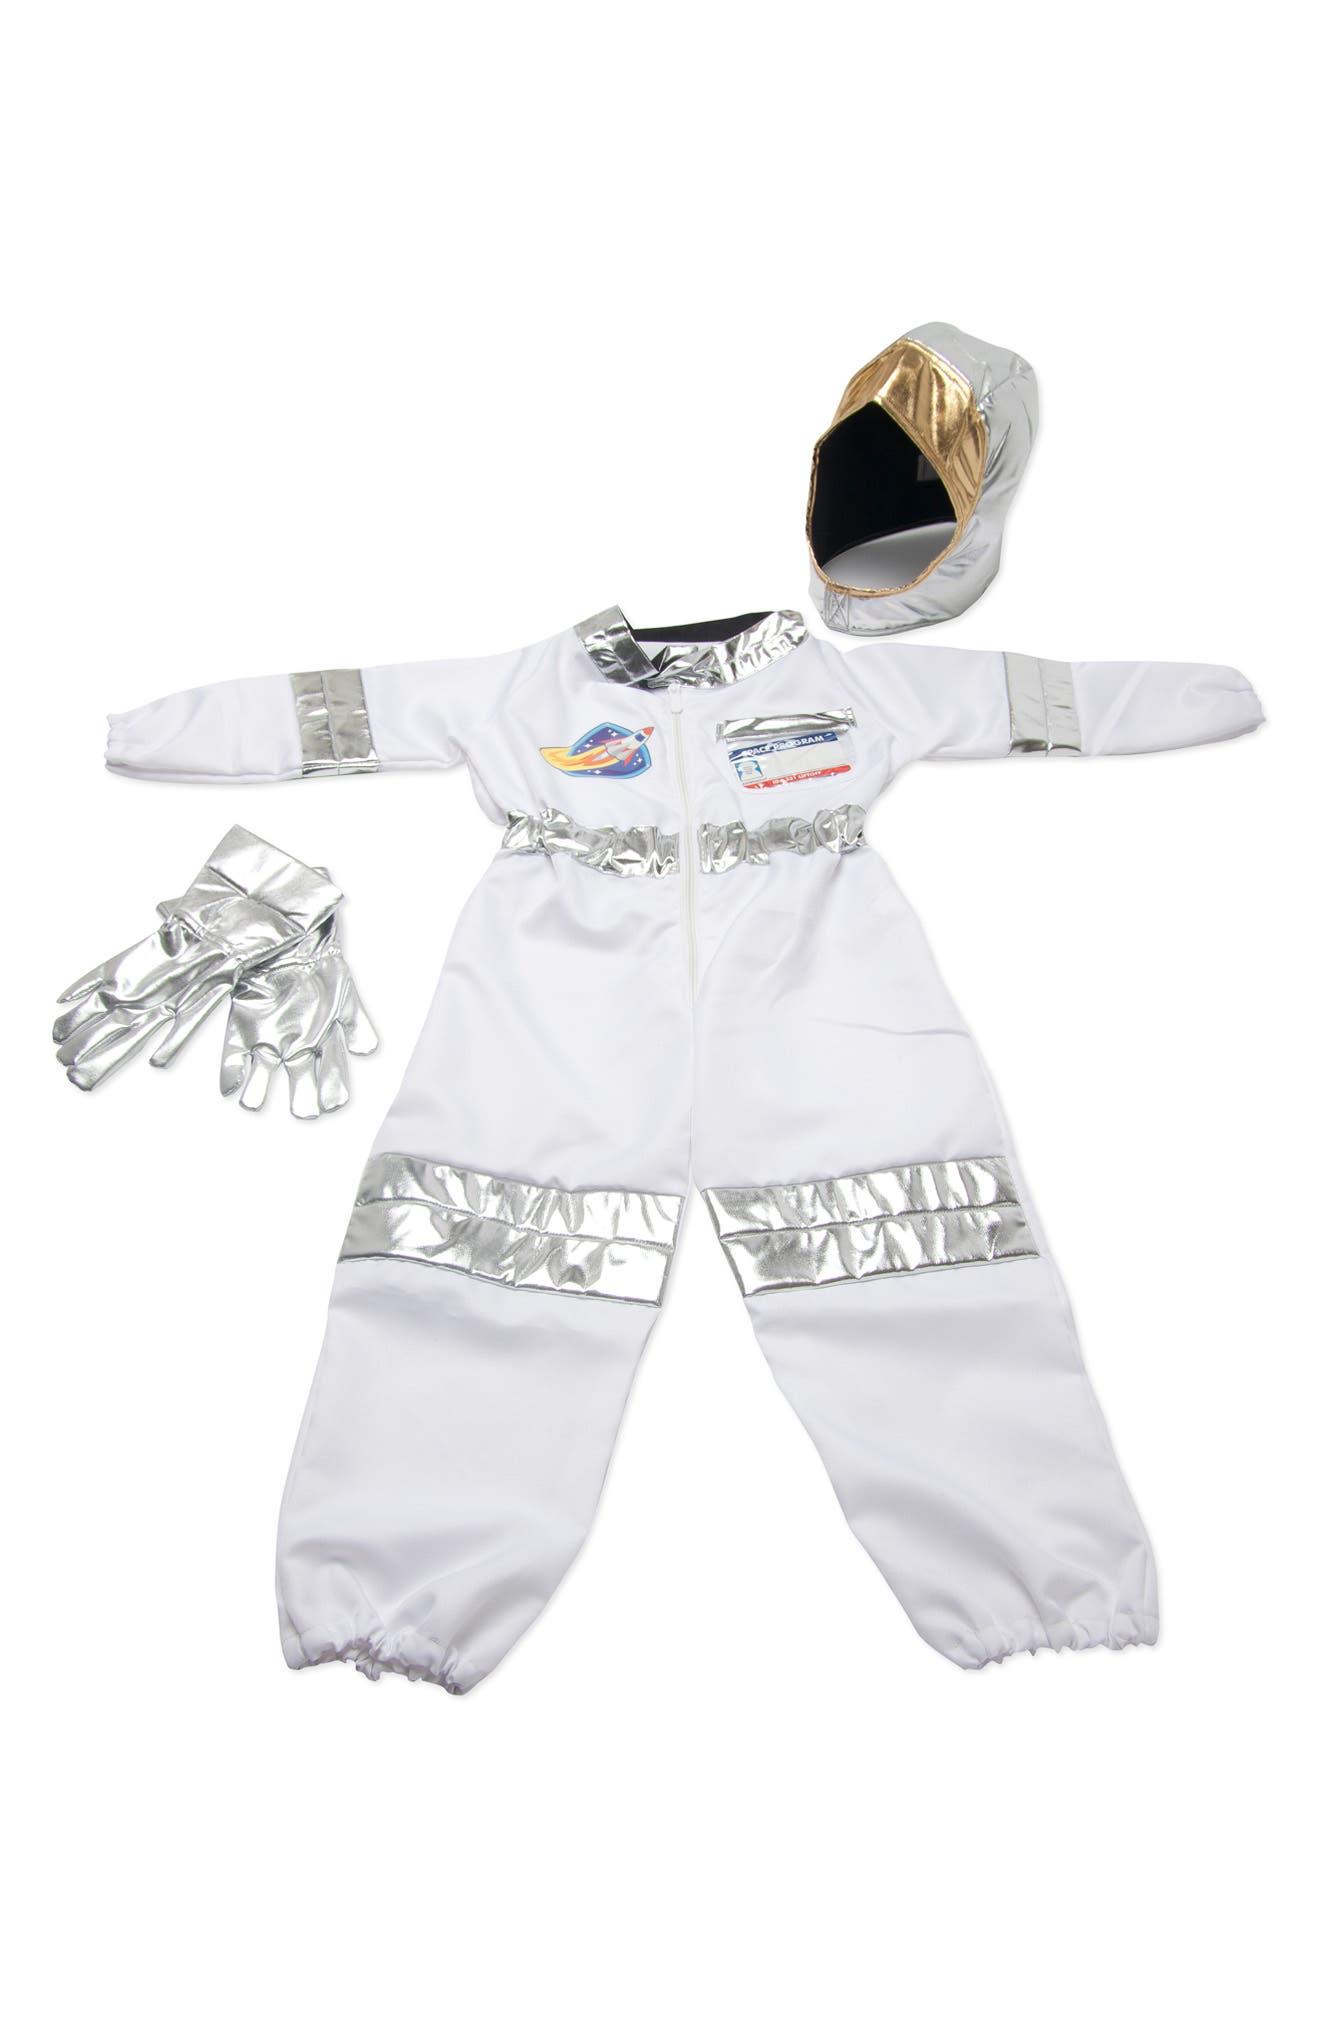 Astronaut Role Play Set,                         Main,                         color, 040